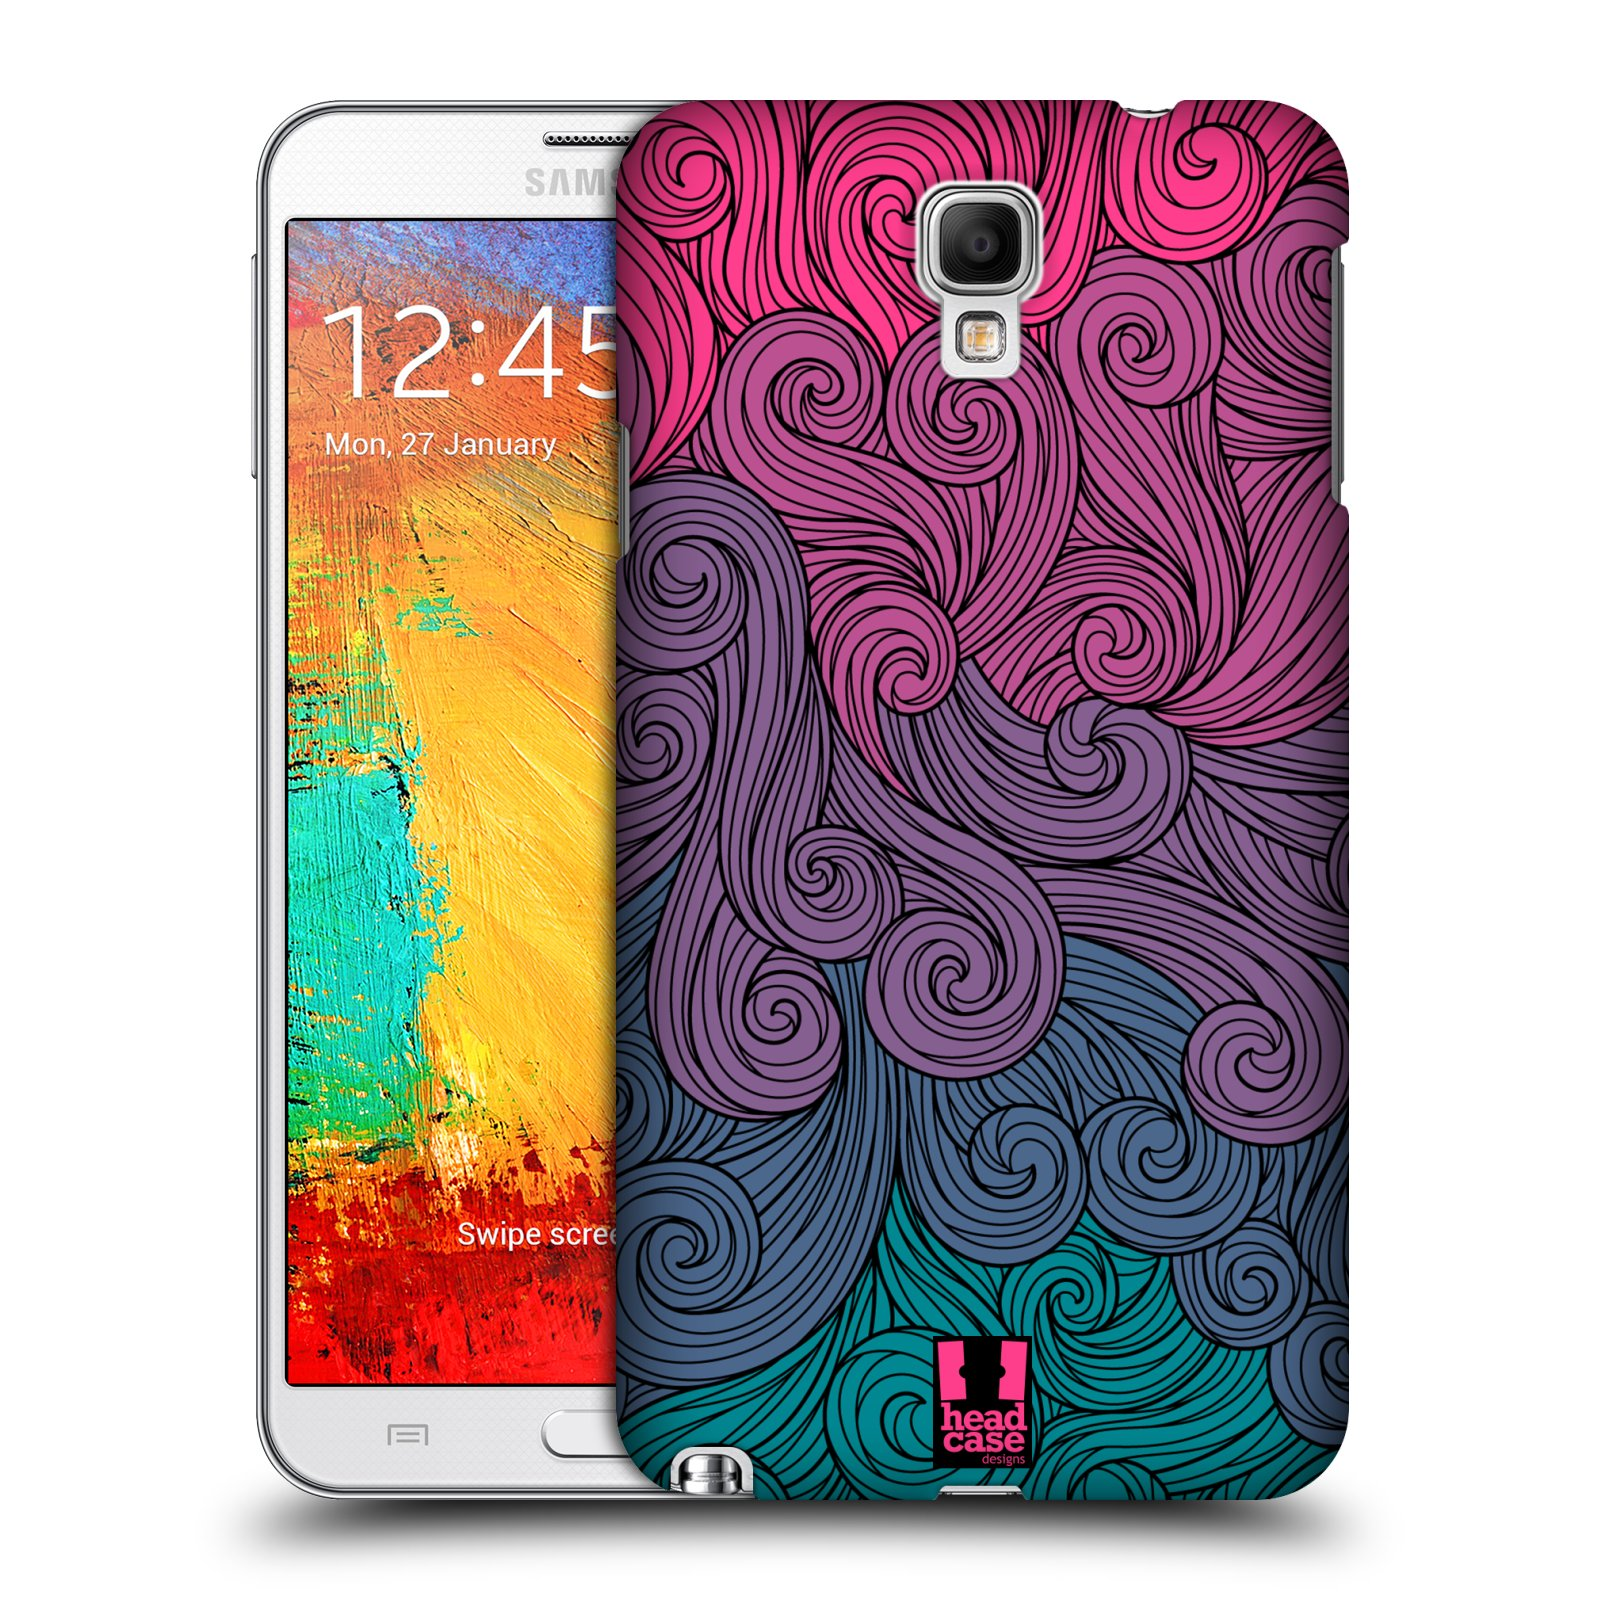 Plastové pouzdro na mobil Samsung Galaxy Note 3 Neo HEAD CASE Swirls Hot Pink (Kryt či obal na mobilní telefon Samsung Galaxy Note 3 Neo SM-N7505)